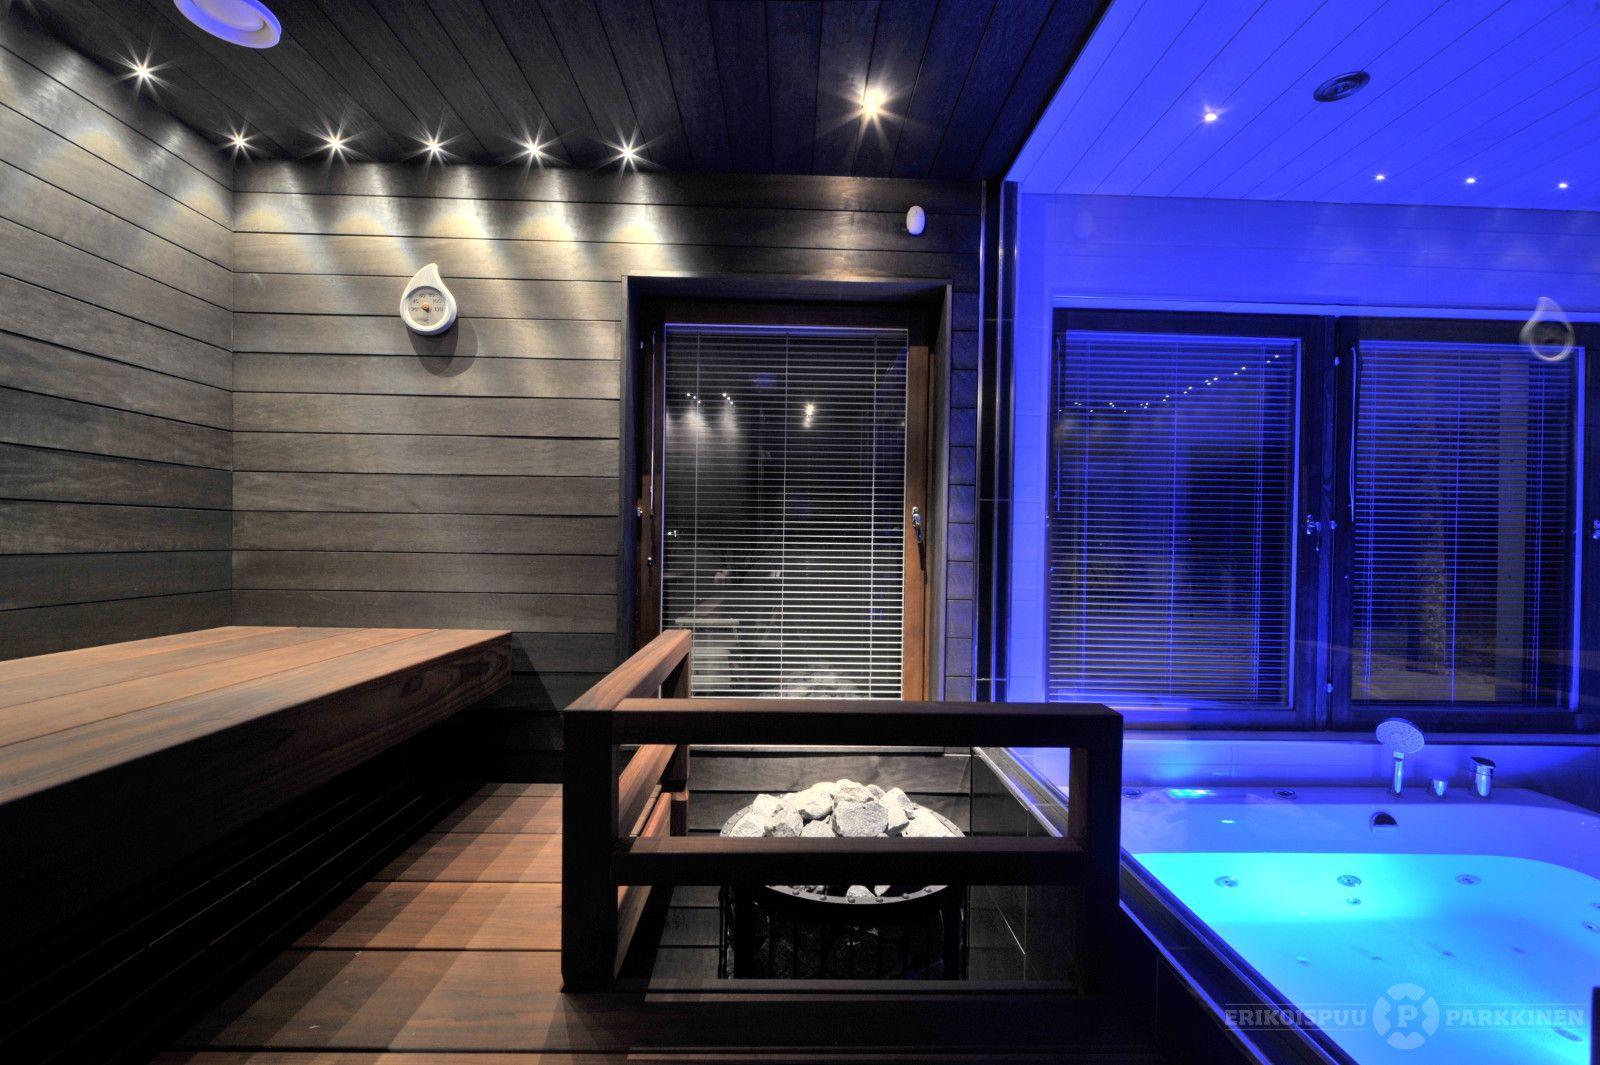 Erikoispuu Sauna Flat Screen Diy Projects